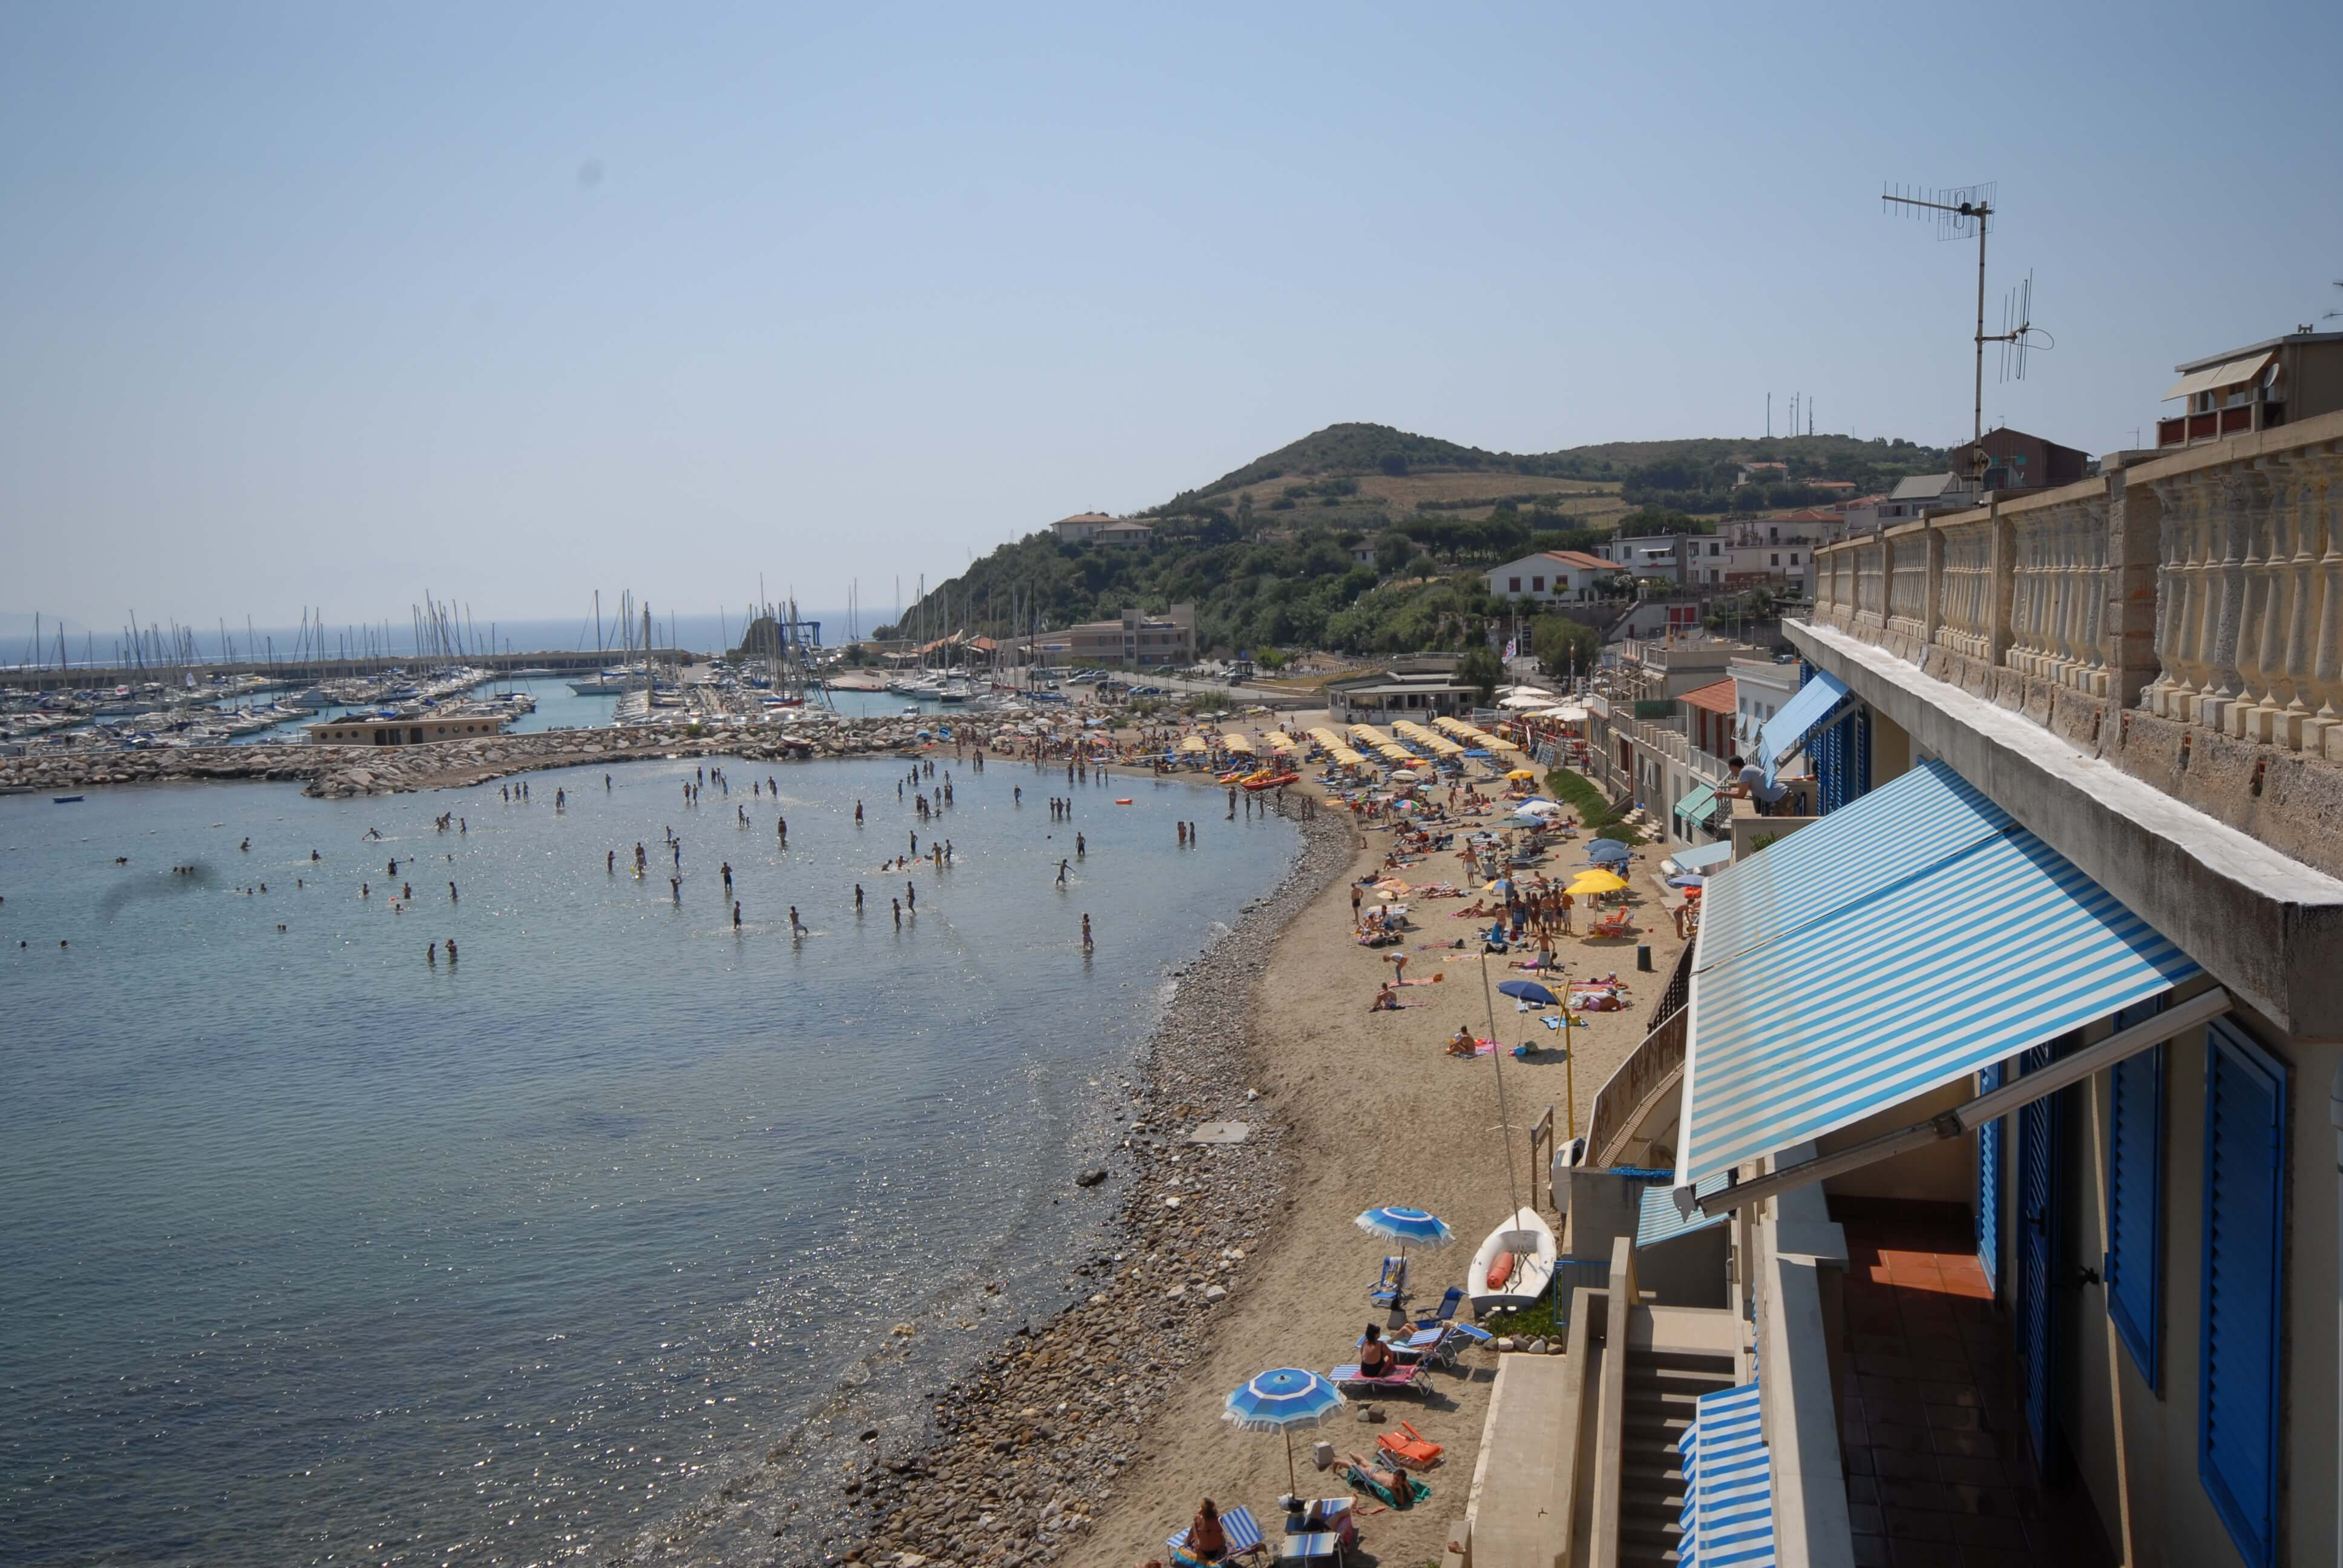 Marina di Salivoli Spiaggia